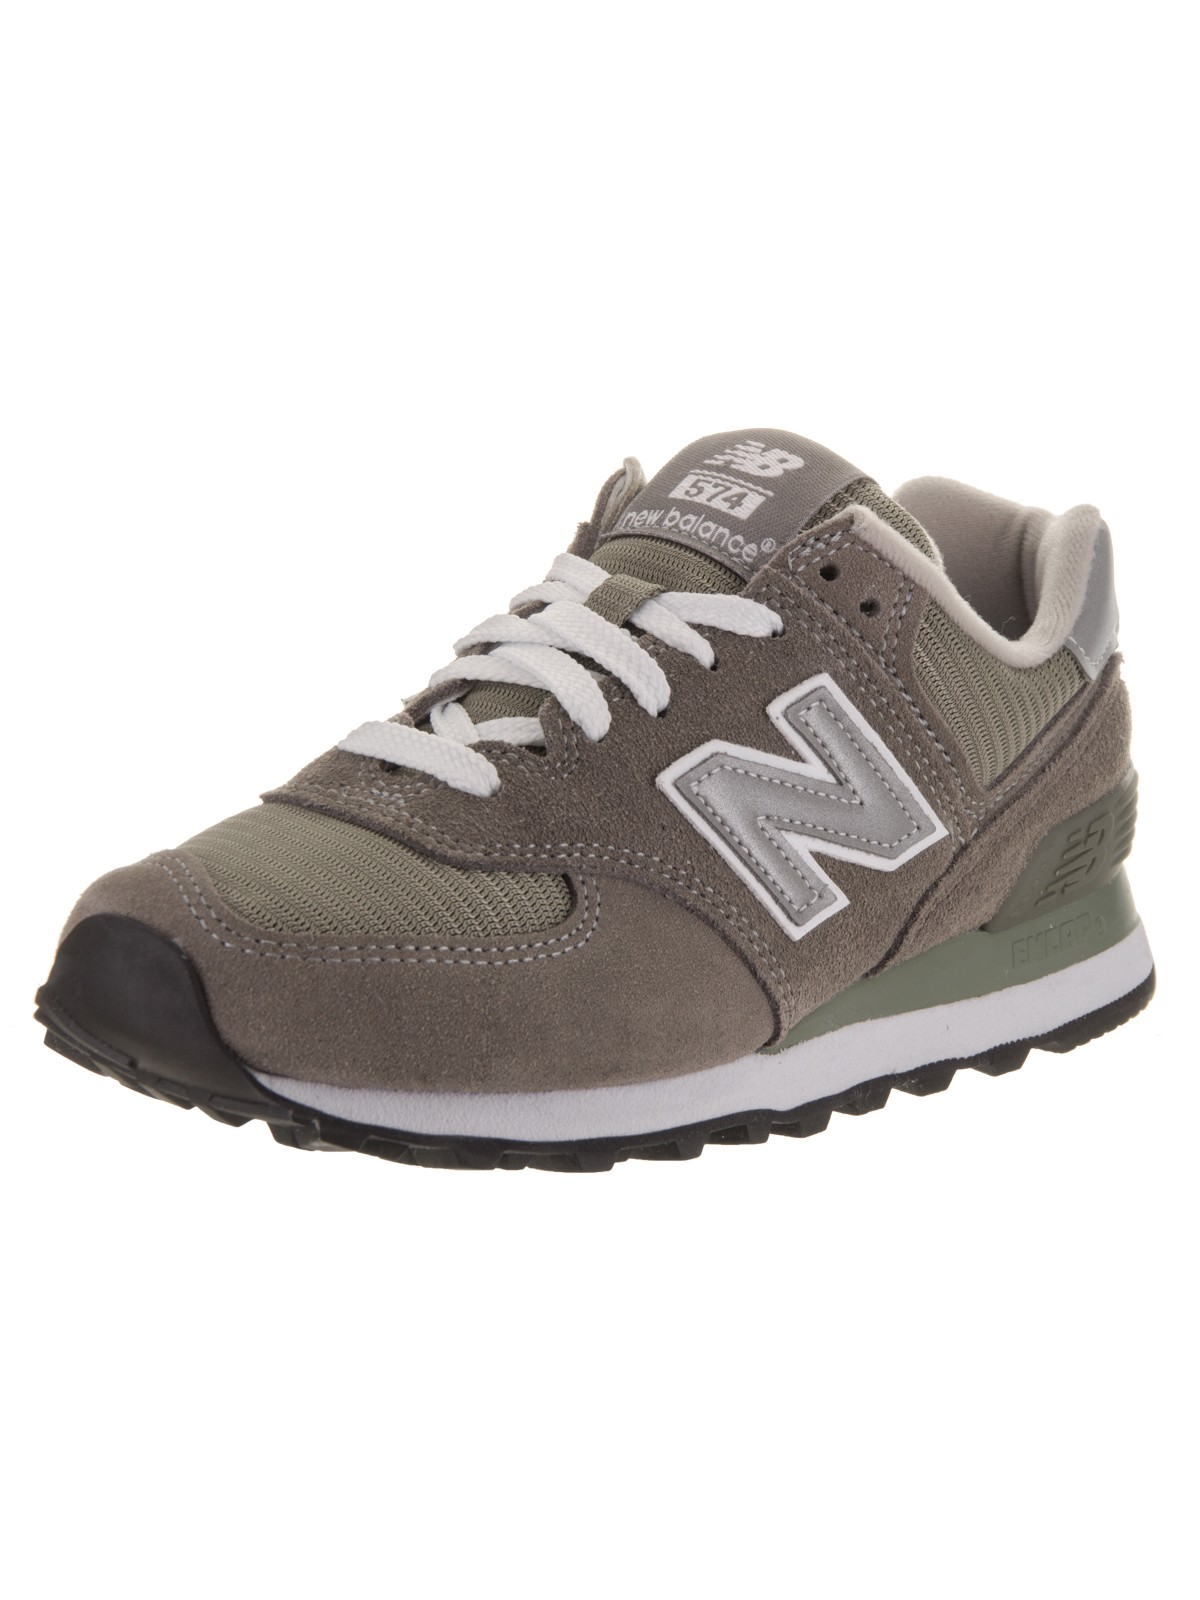 New Balance Women's 574 Classics Running Shoe by New Balance